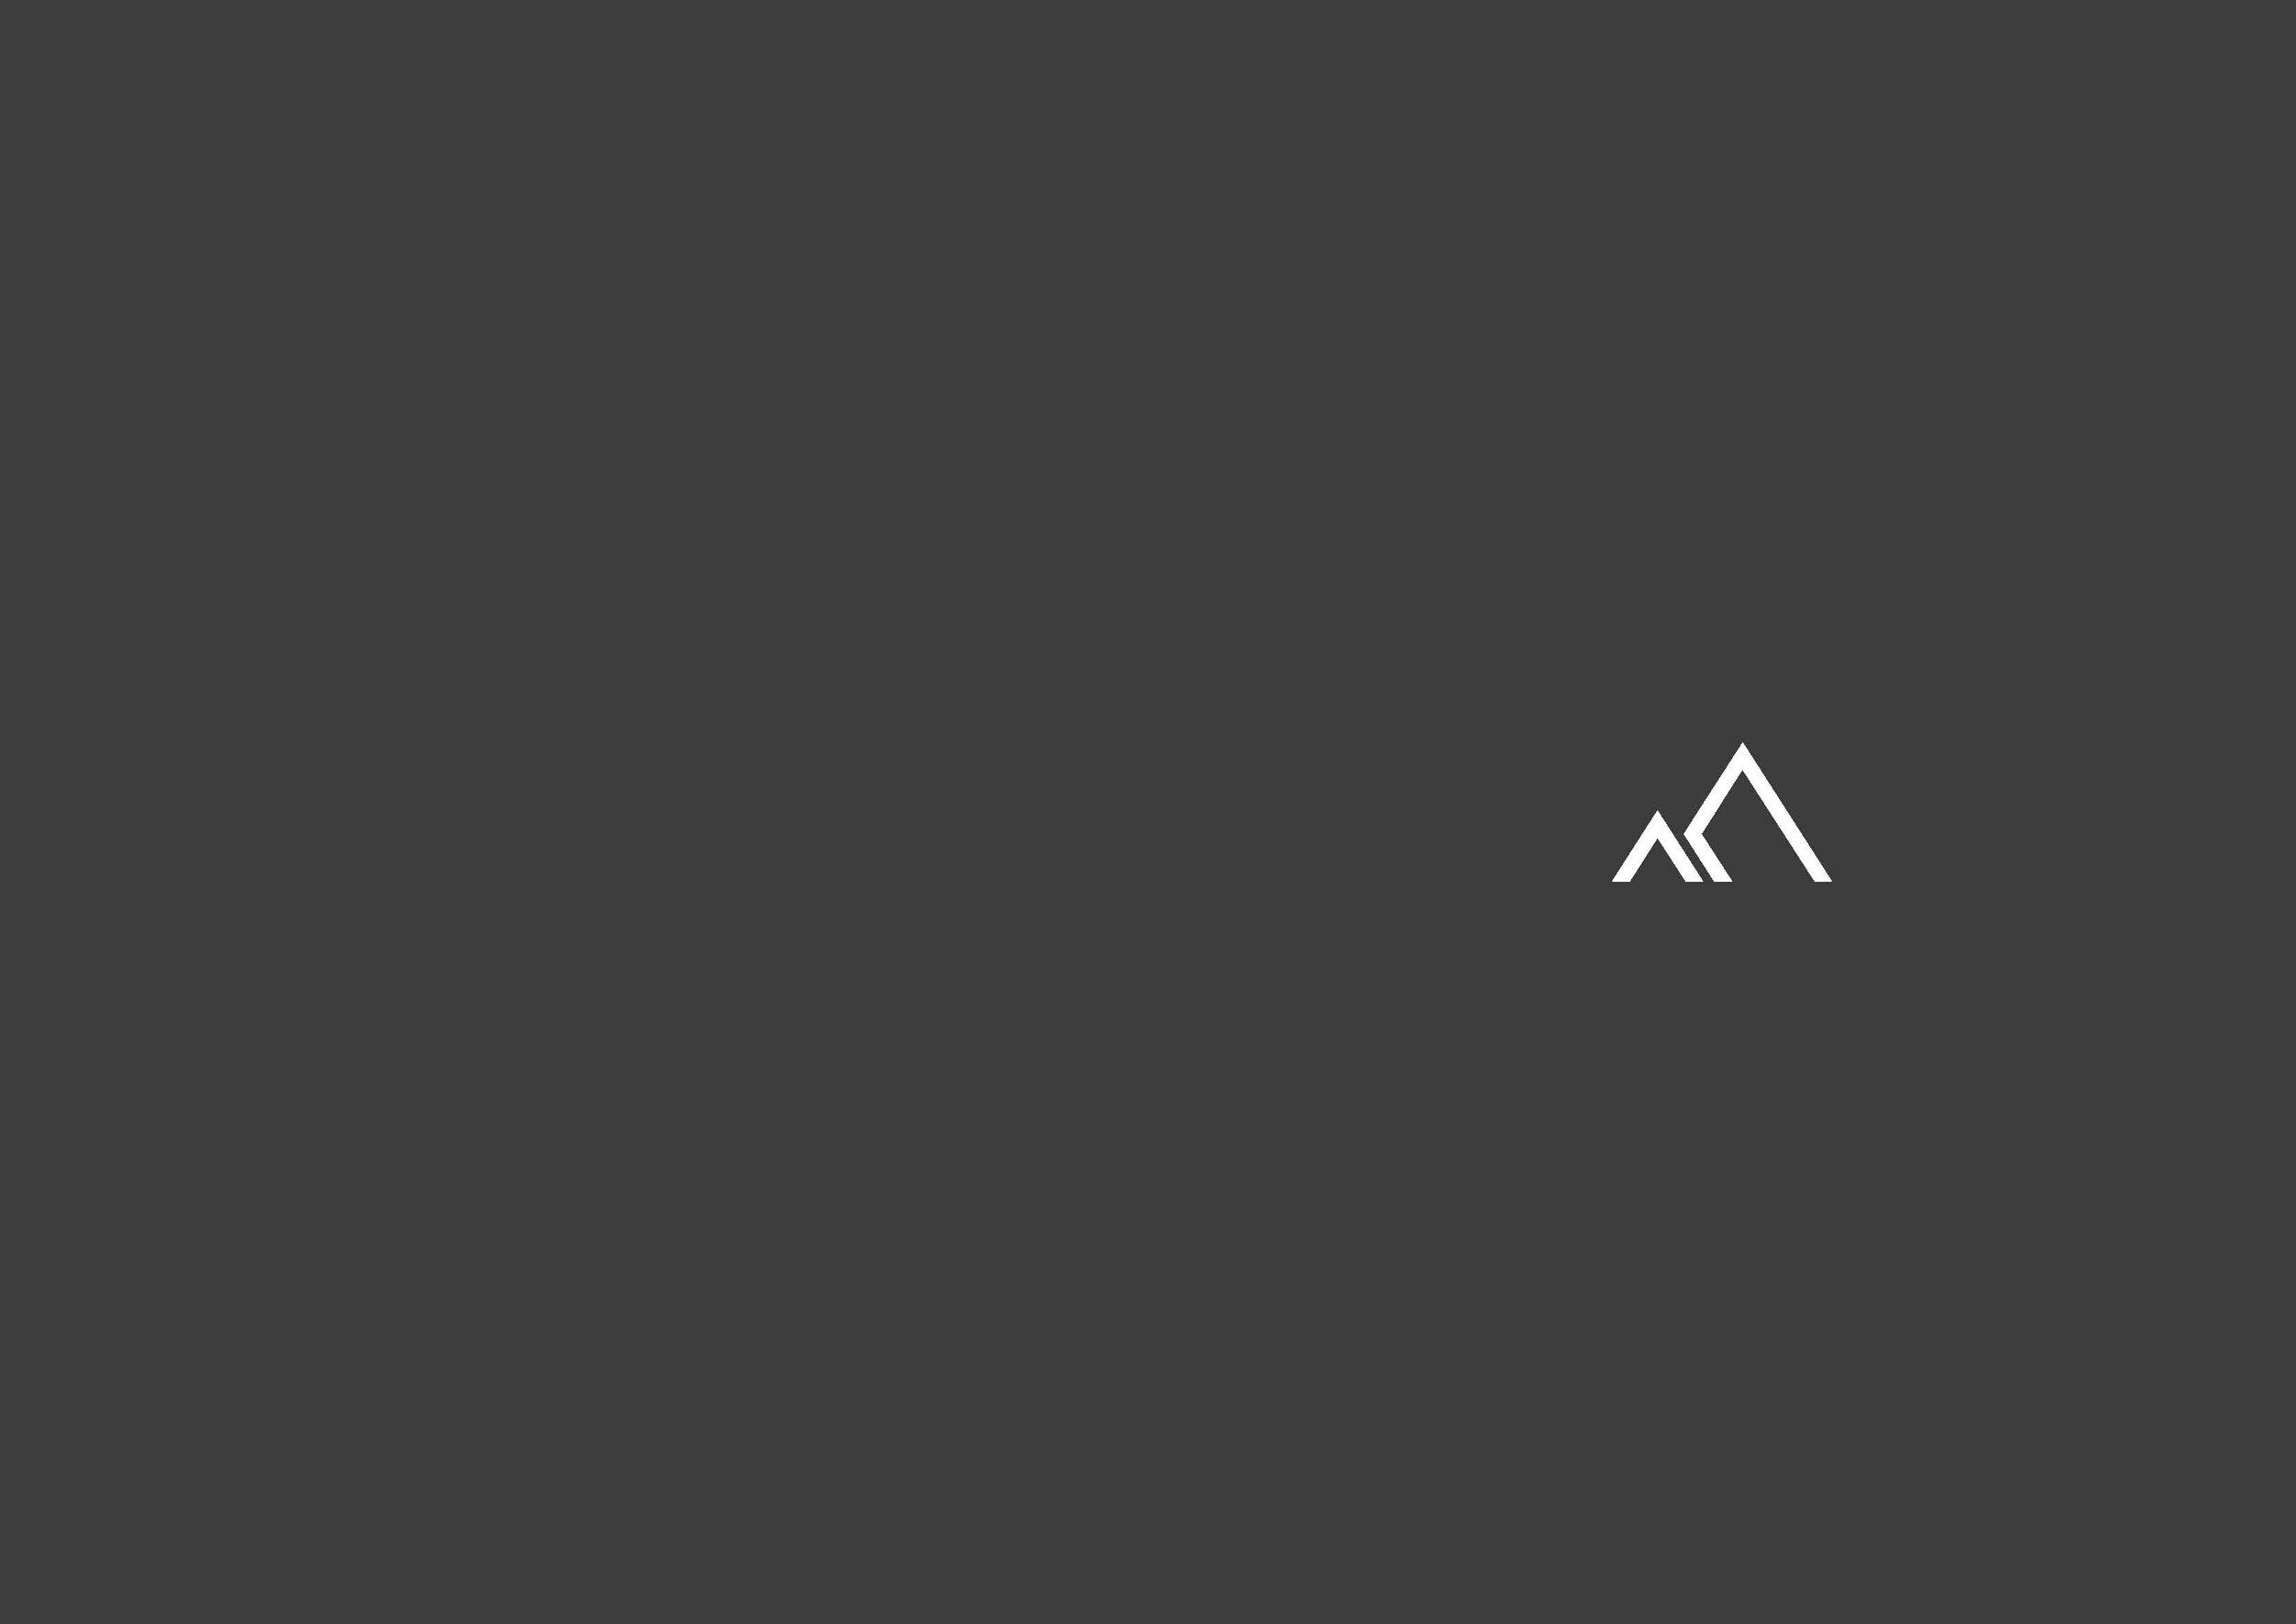 Høyden-A4-Eiendomsservice-Lowres_Web_Side_16.jpg